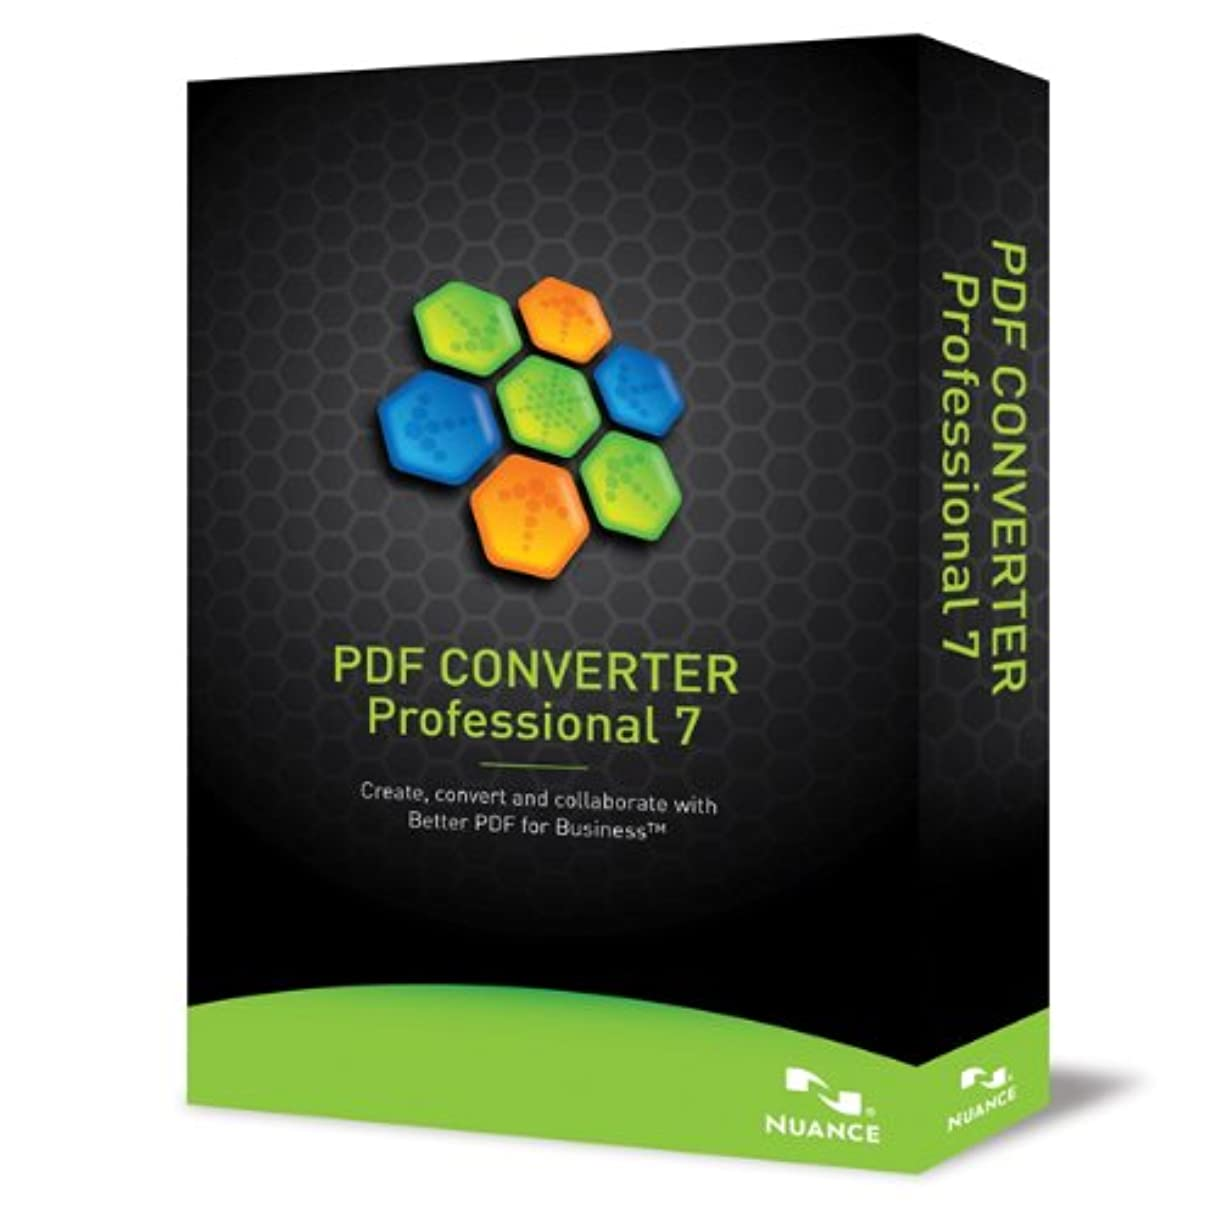 PDF Converter Professional 7.0, US English